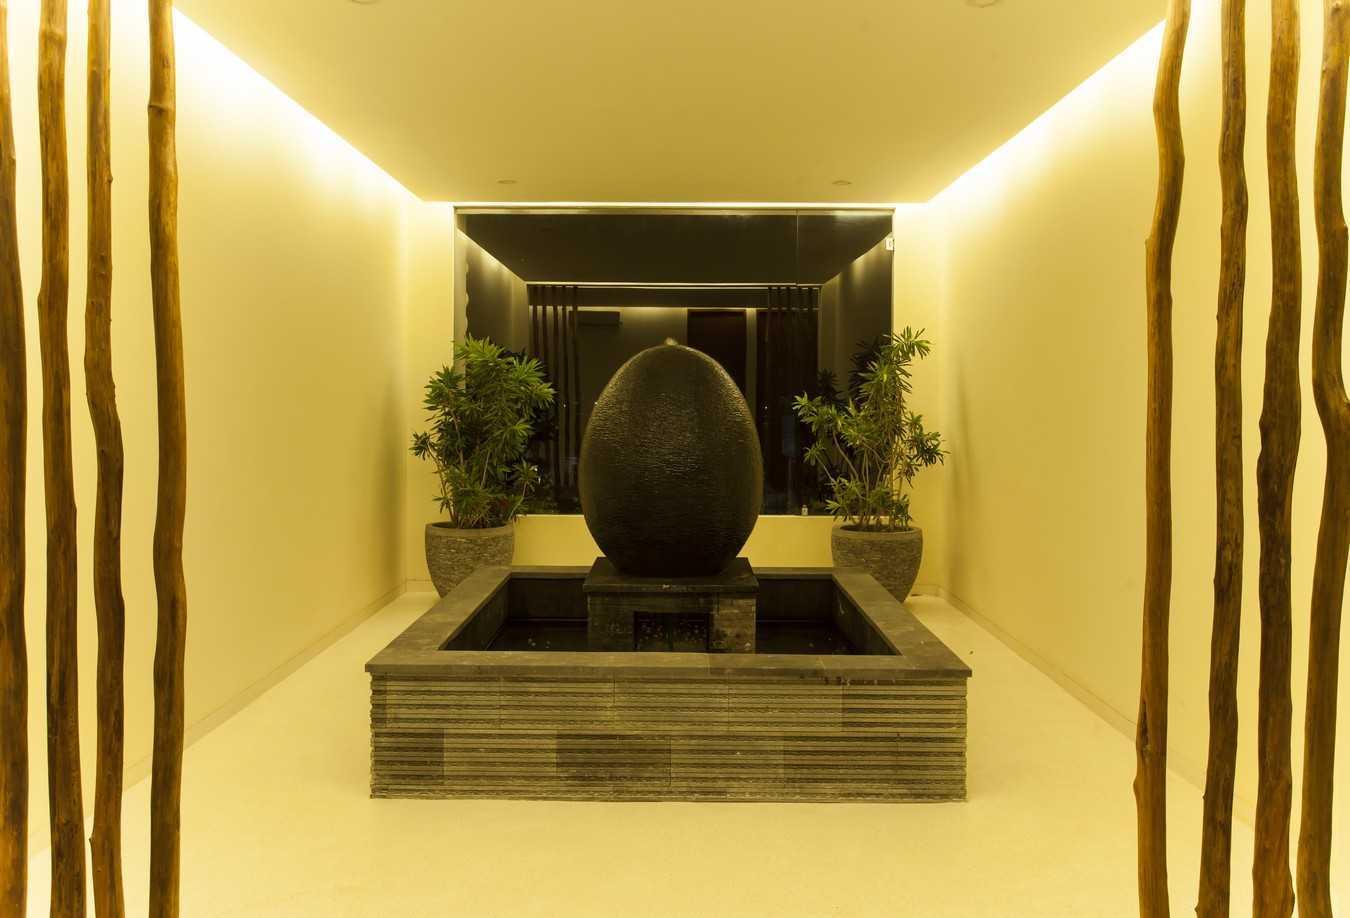 Emporio Architect Zen Family Spa Nusa Dua Benoa, Kec. Kuta Sel., Kabupaten Badung, Bali, Indonesia Benoa, Kec. Kuta Sel., Kabupaten Badung, Bali, Indonesia Emporio-Architect-Zen-Family-Spa-Nusa-Dua  72703